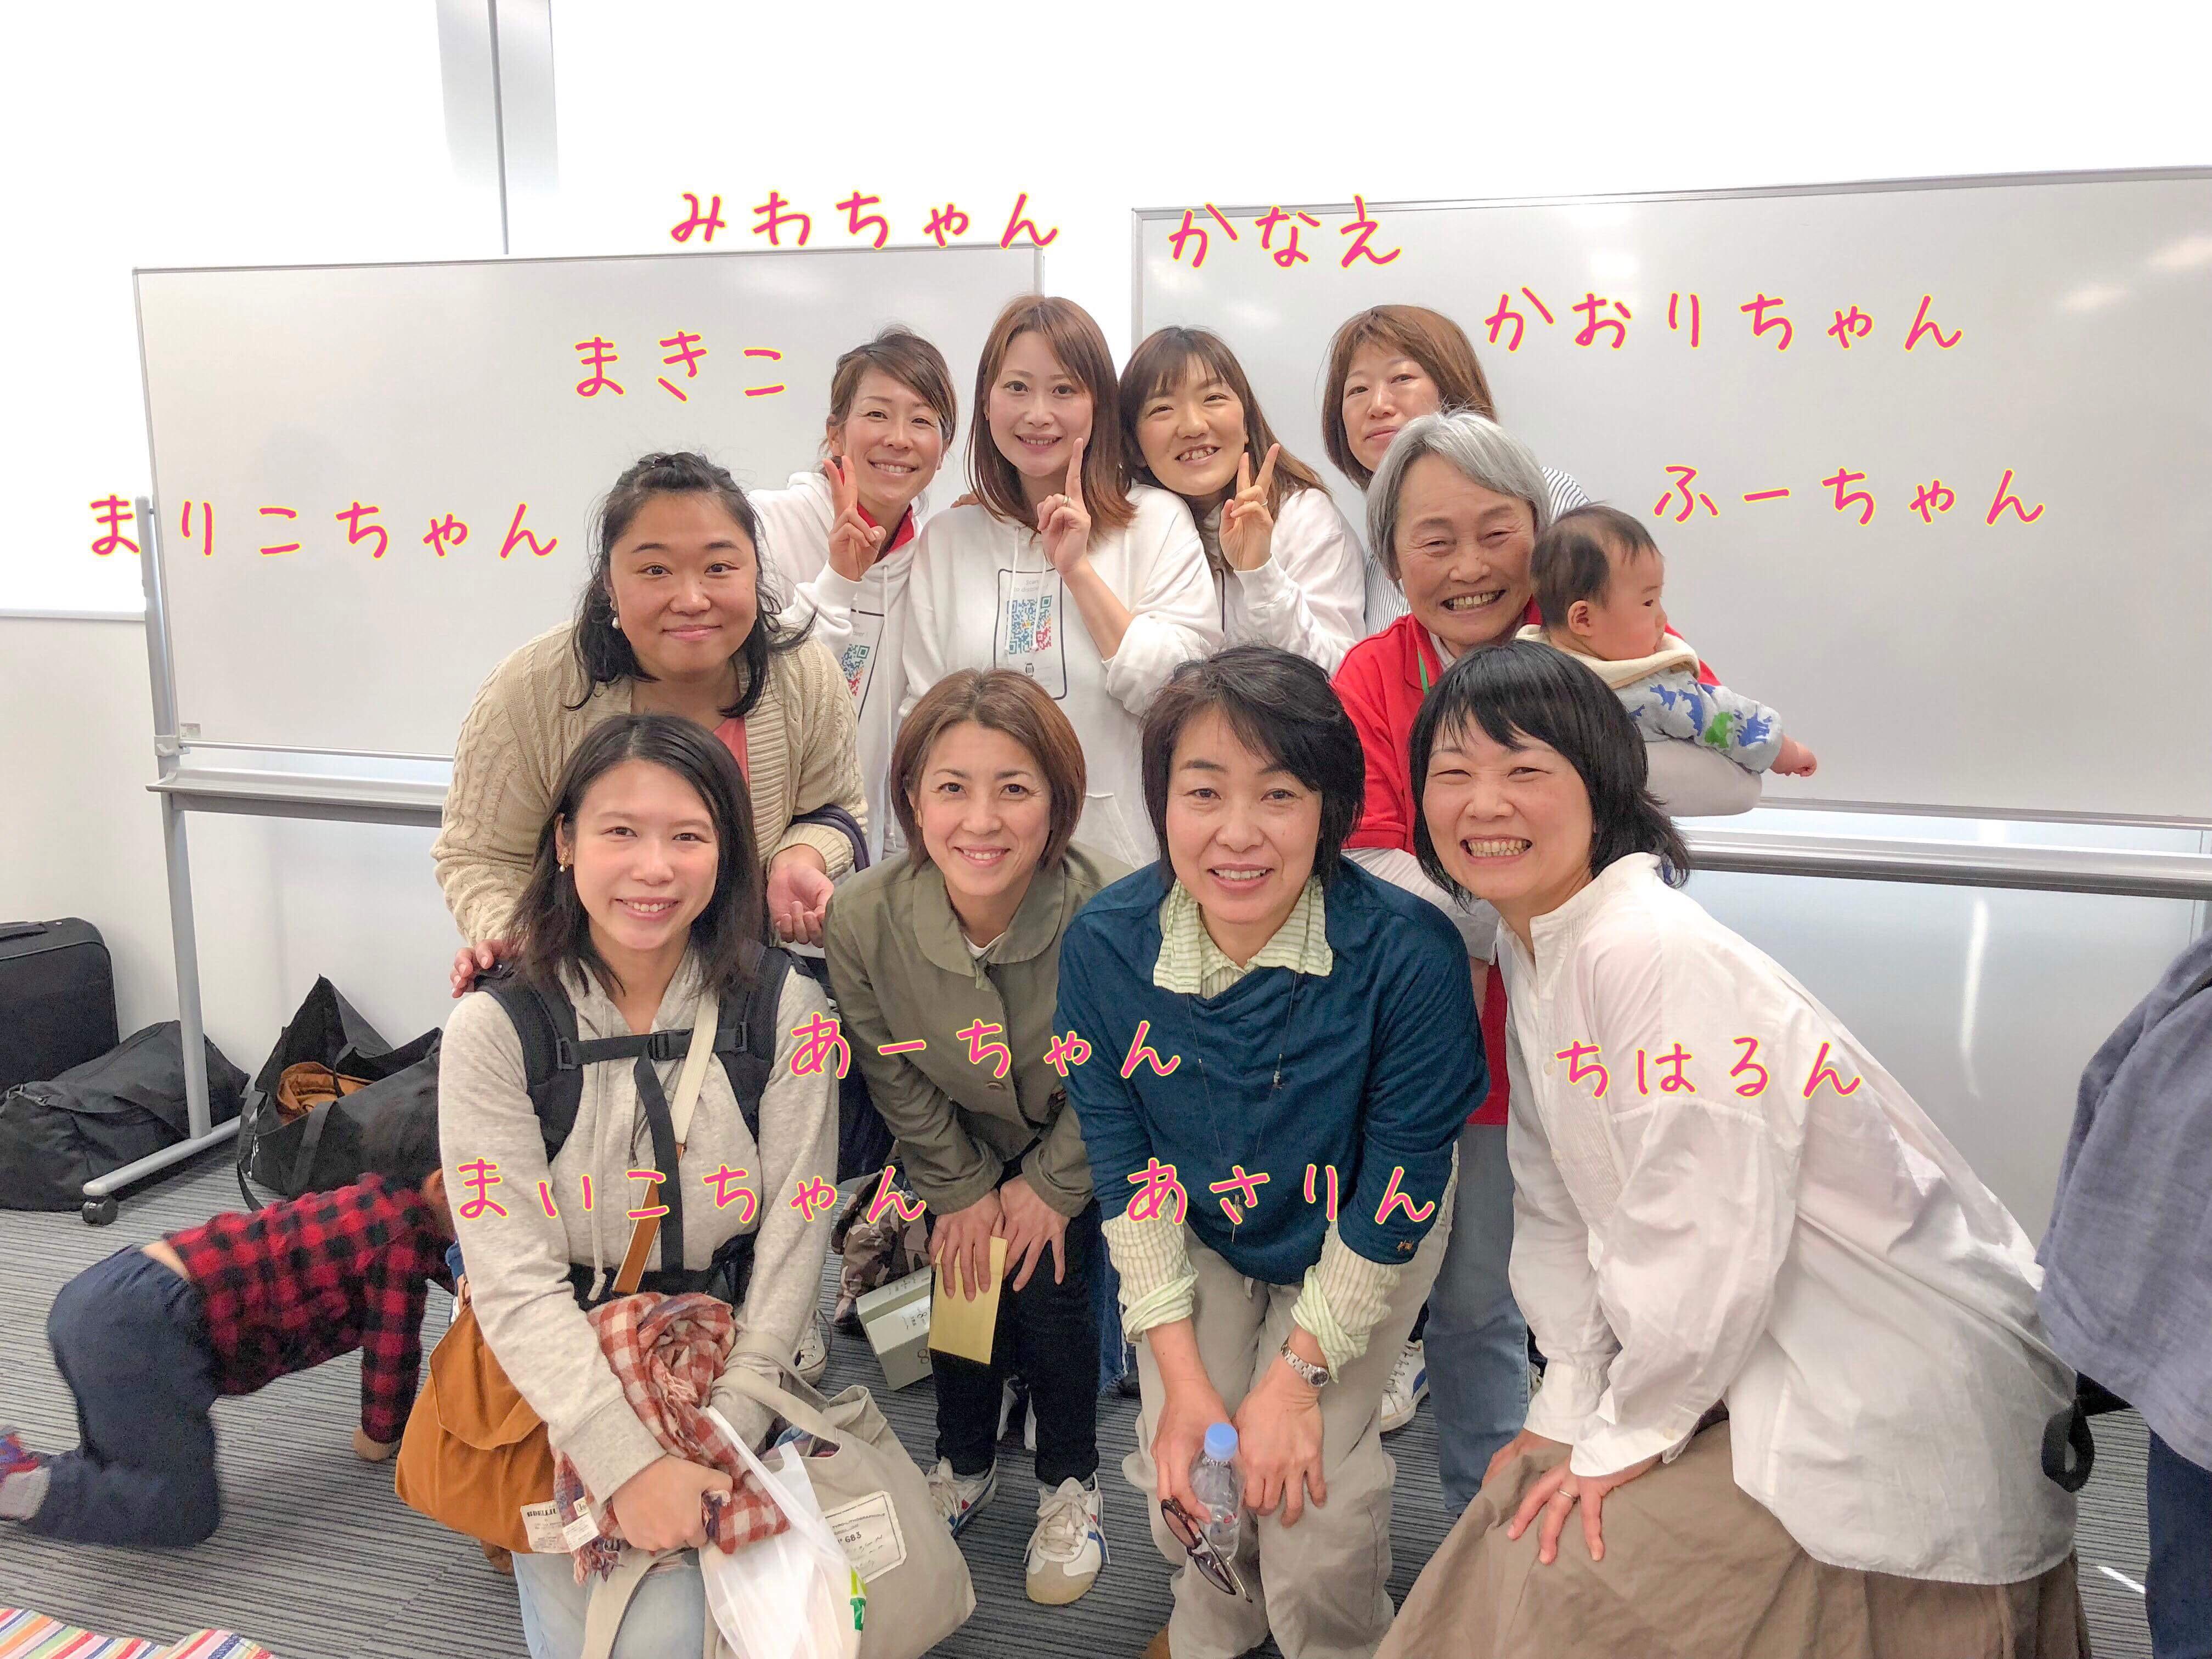 2018/4/24/1010HAPPY藤沢Bグループ     ①魂に響いたお話  ②感想